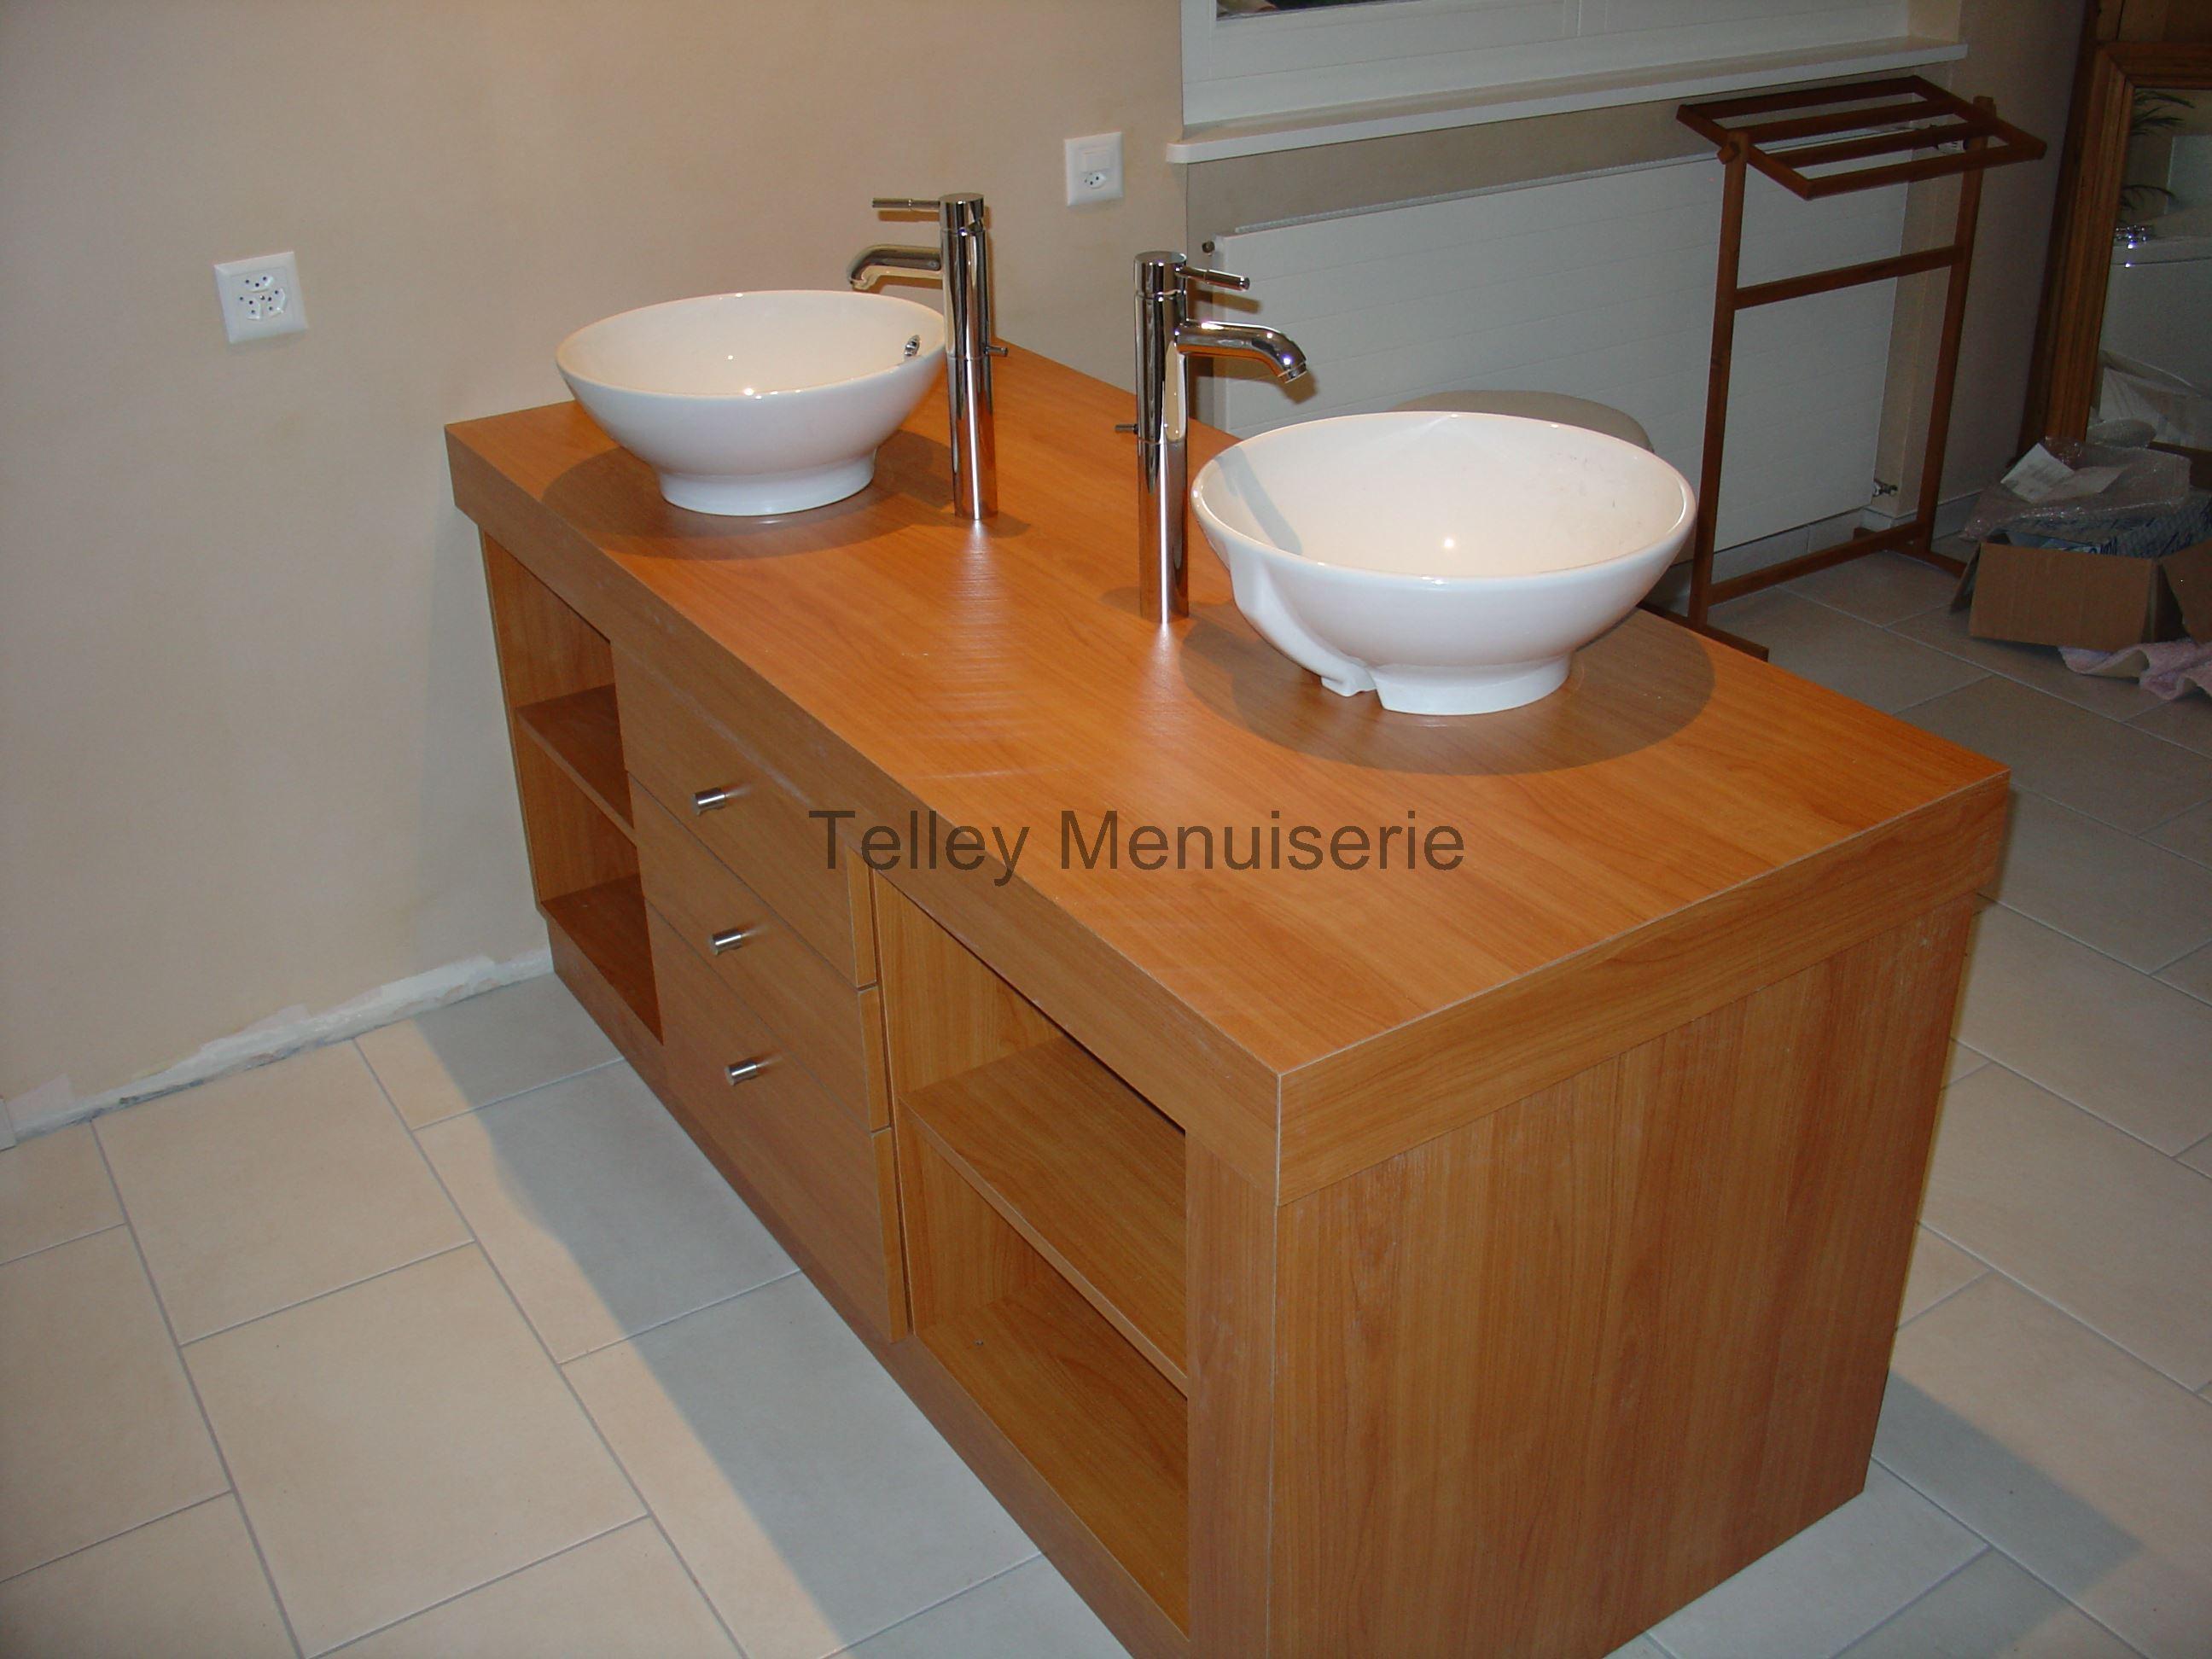 Meubles salle de bain wc menuiserie telley for Meuble de salle de bain wc